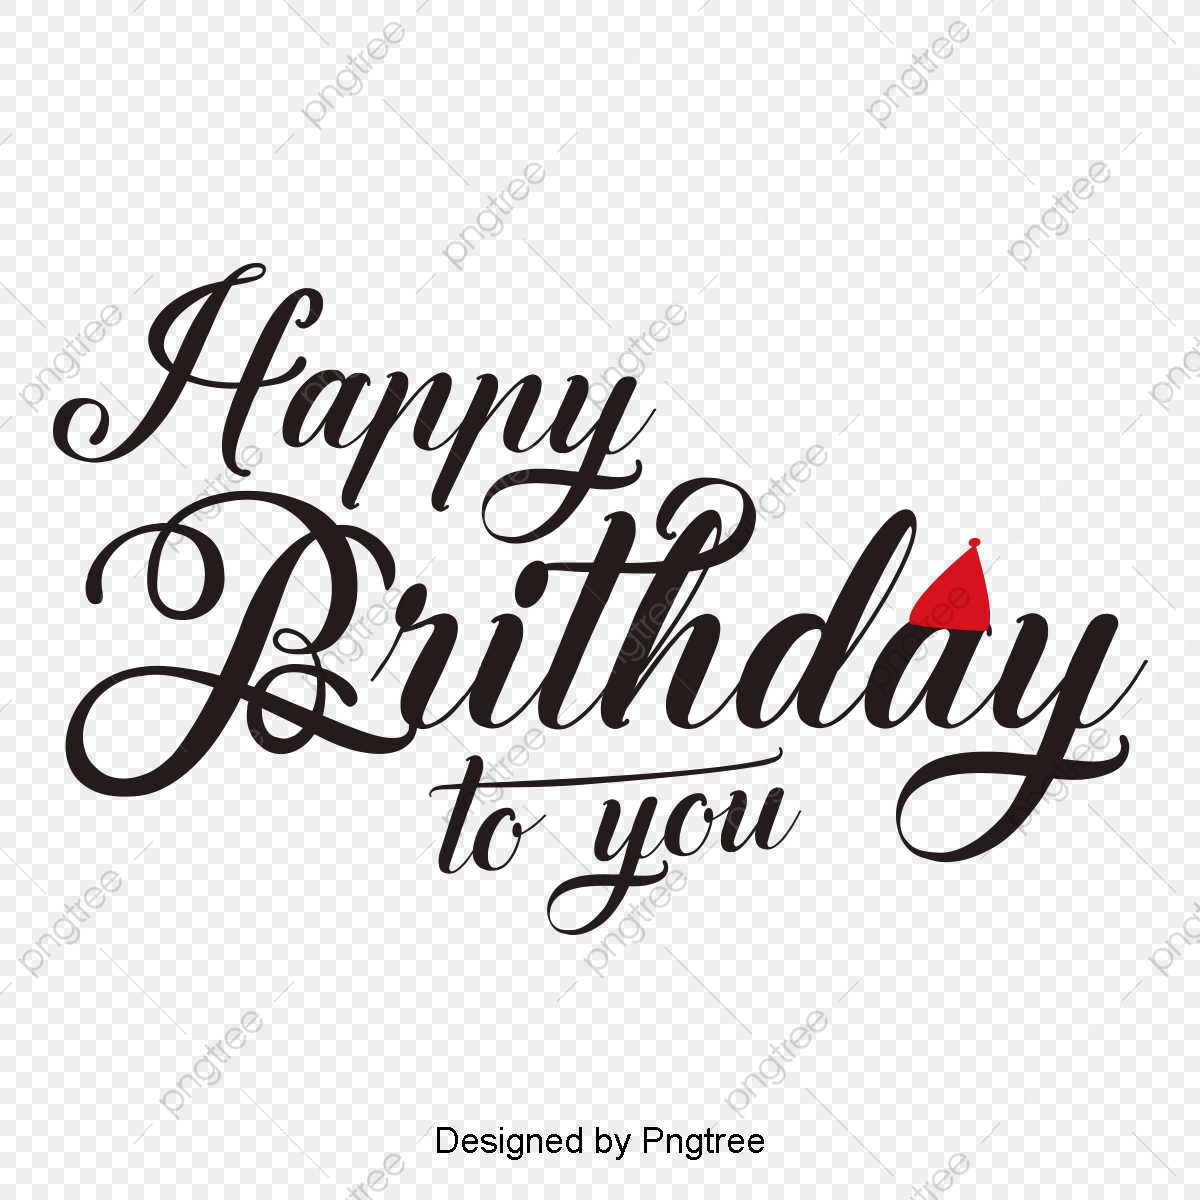 Happy Birthday Wordart, Happy Birthday, Wordart, Happy